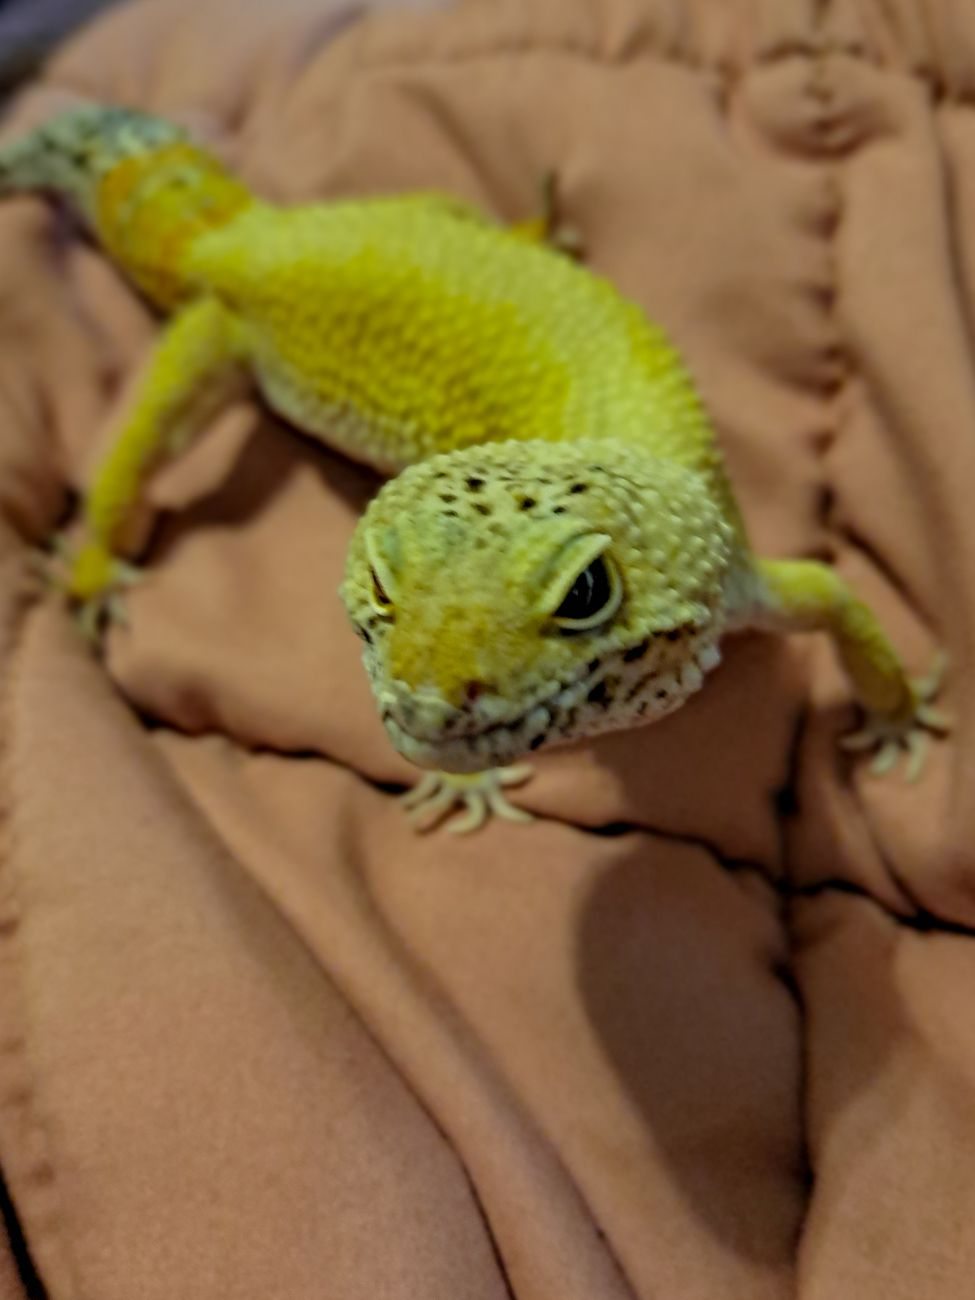 Lizzie is our pet Leopard Gecko